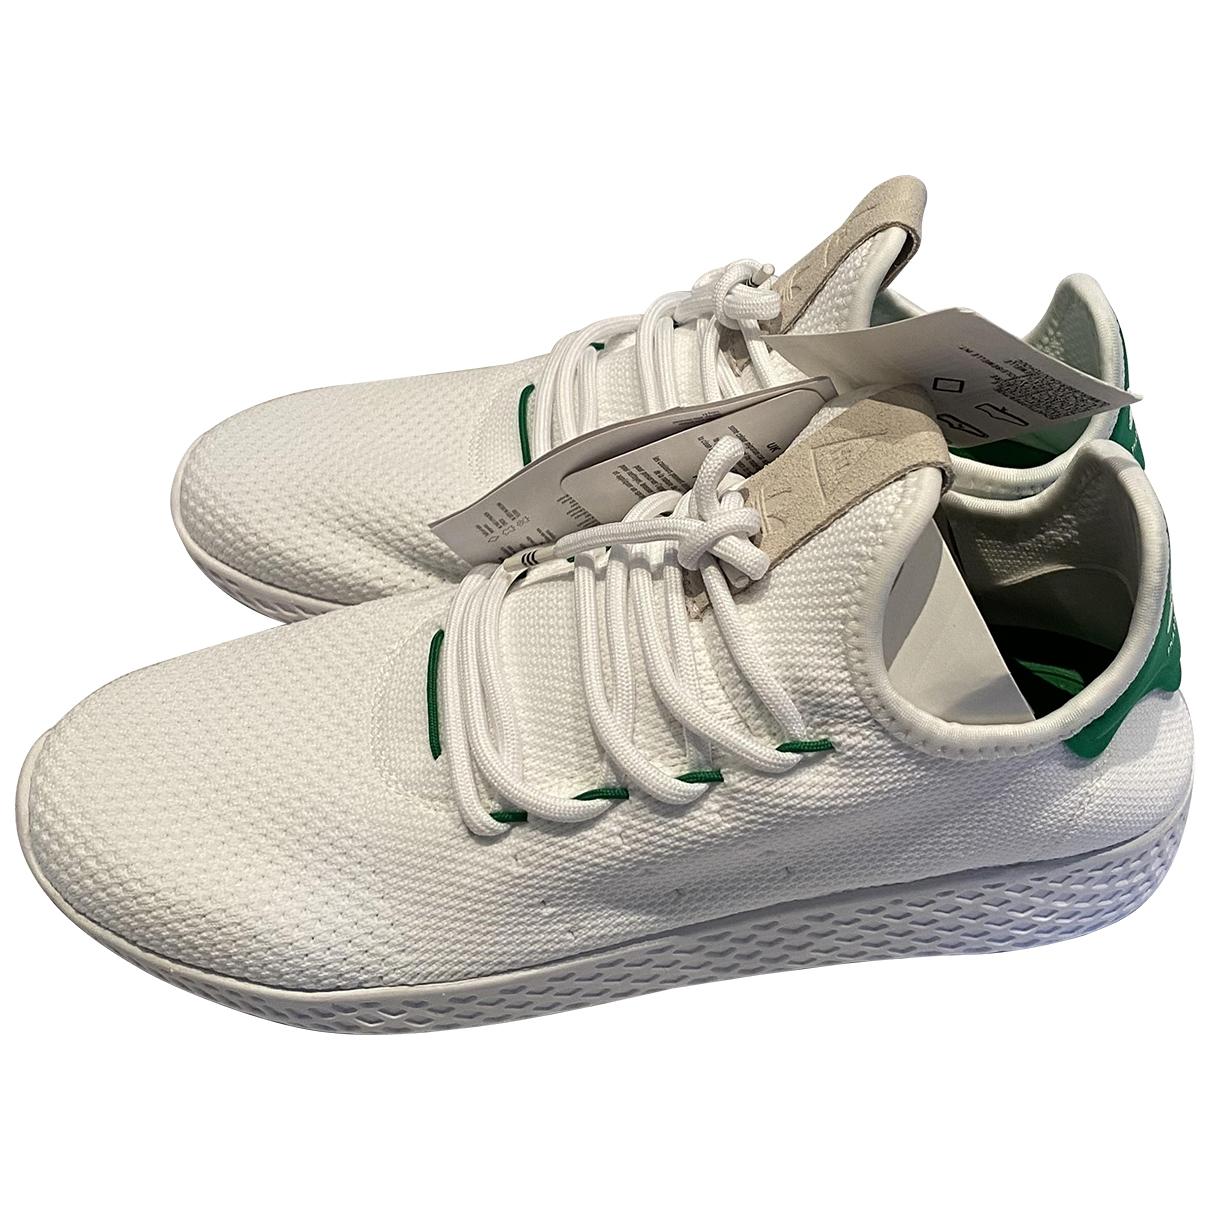 Deportivas NMD Hu de Lona Adidas X Pharrell Williams